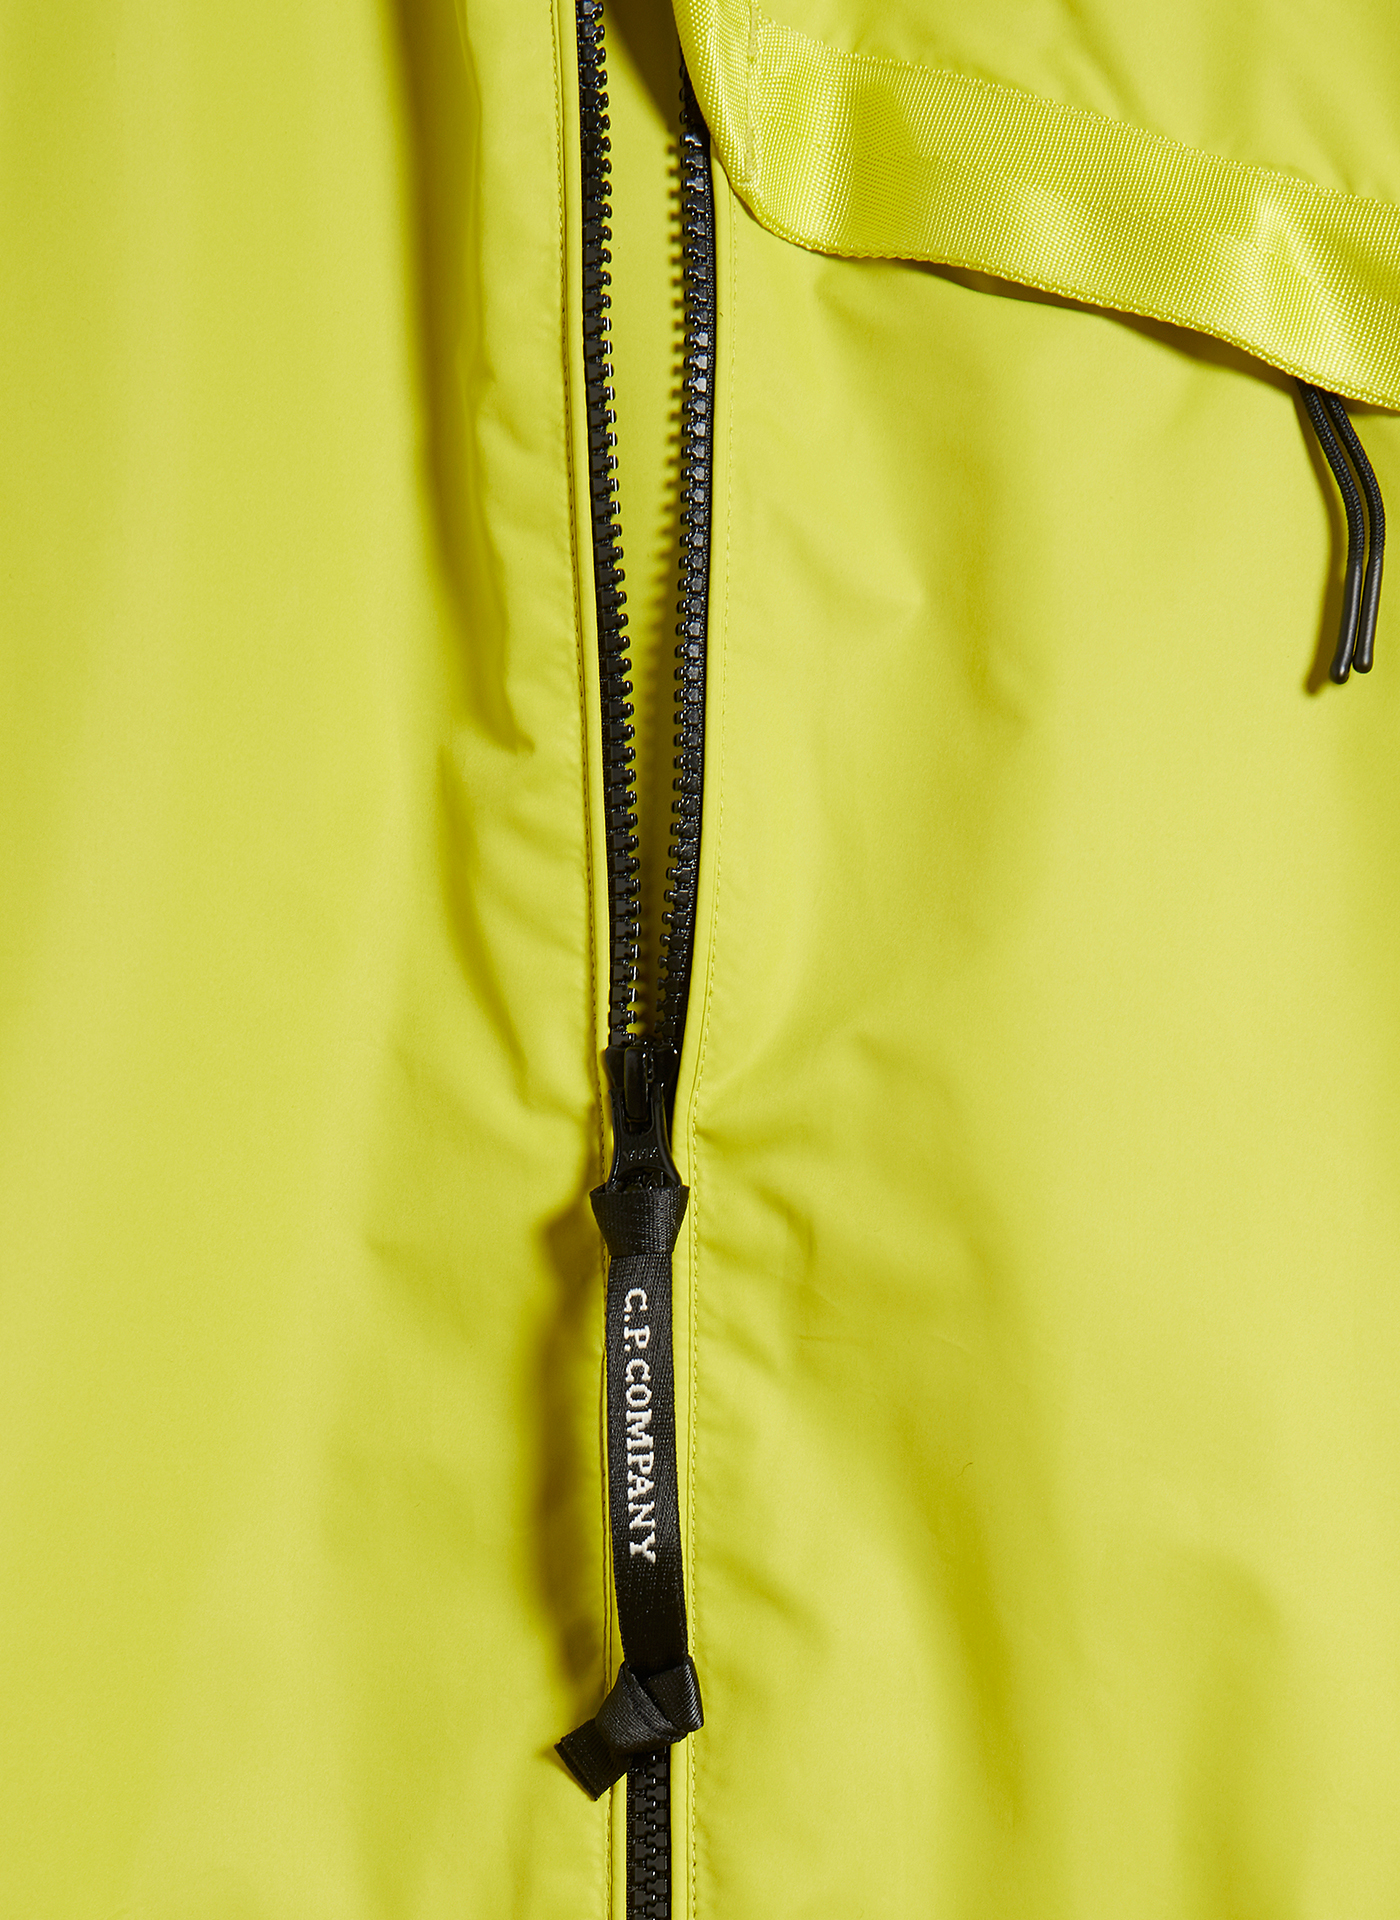 Detail shot of a black zipper of a Bright yellow C.P. Company jacket